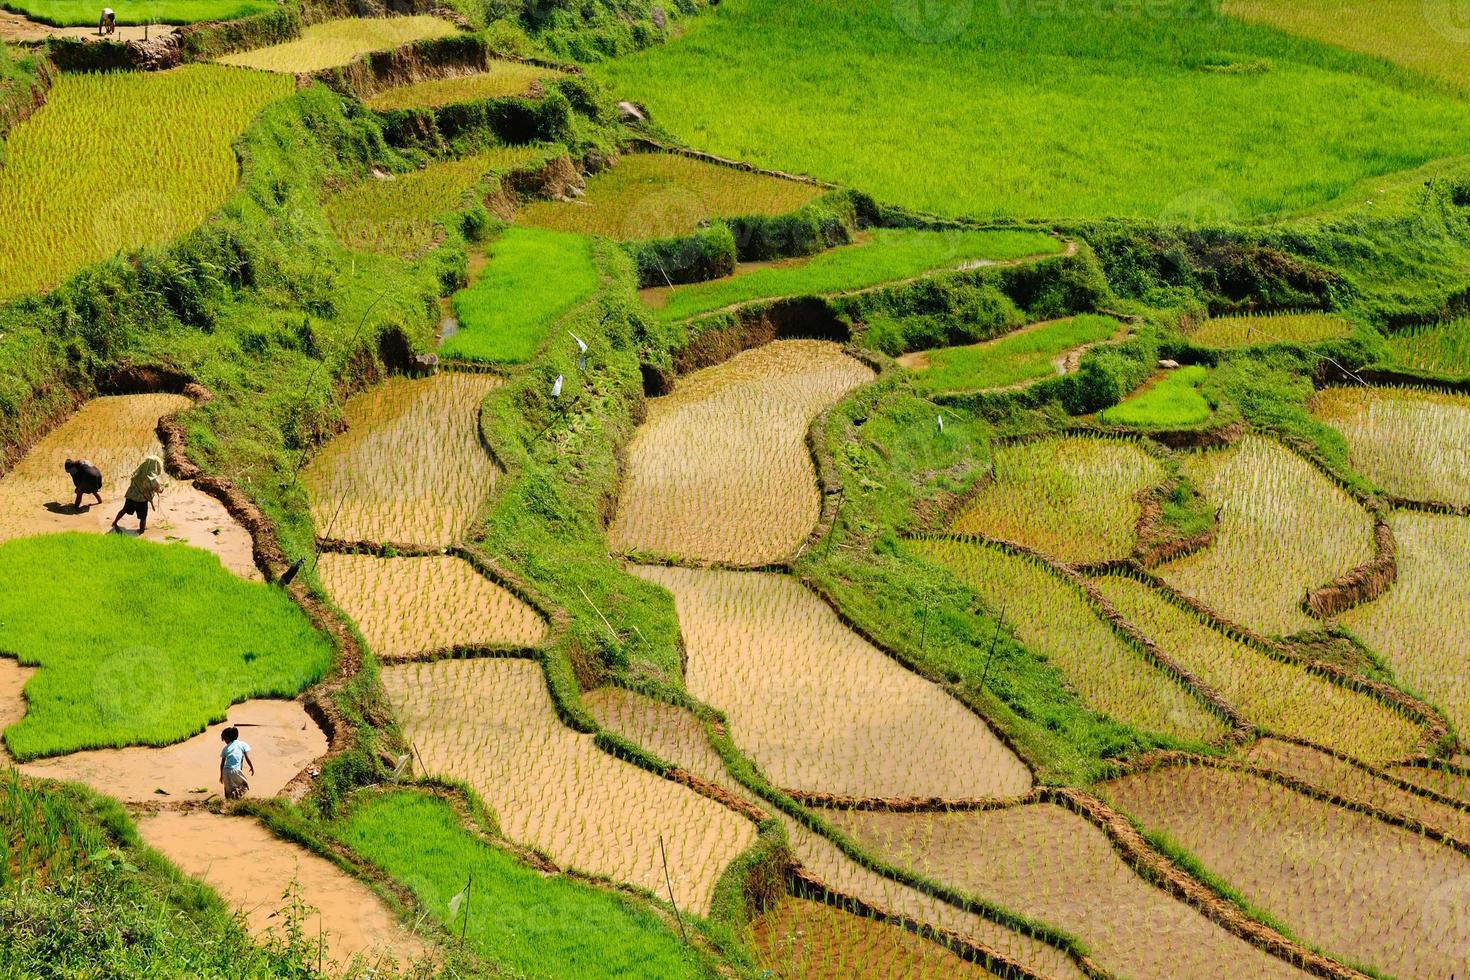 indonesia, sulawesi, tana toraja, terrazas de arroz foto